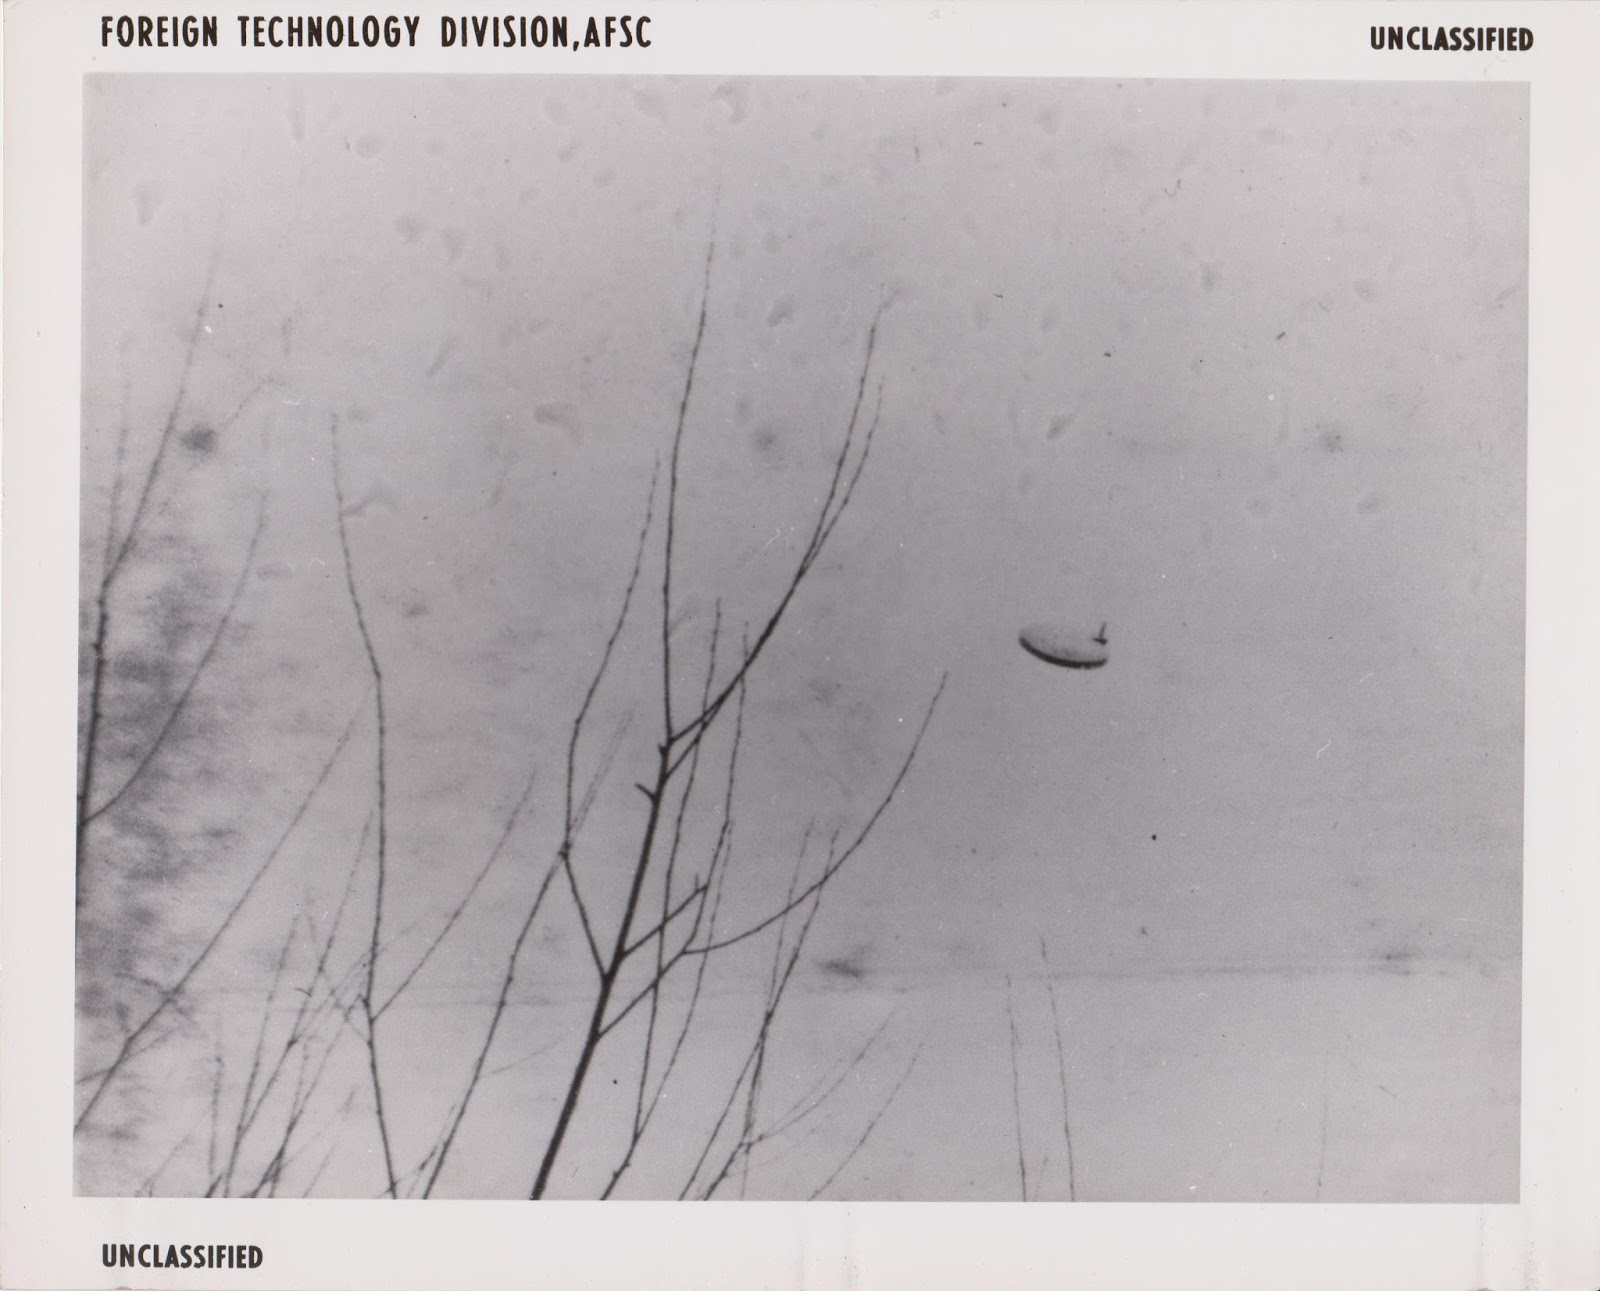 UFO FOTOCAT BLOG on Feedspot - Rss Feed